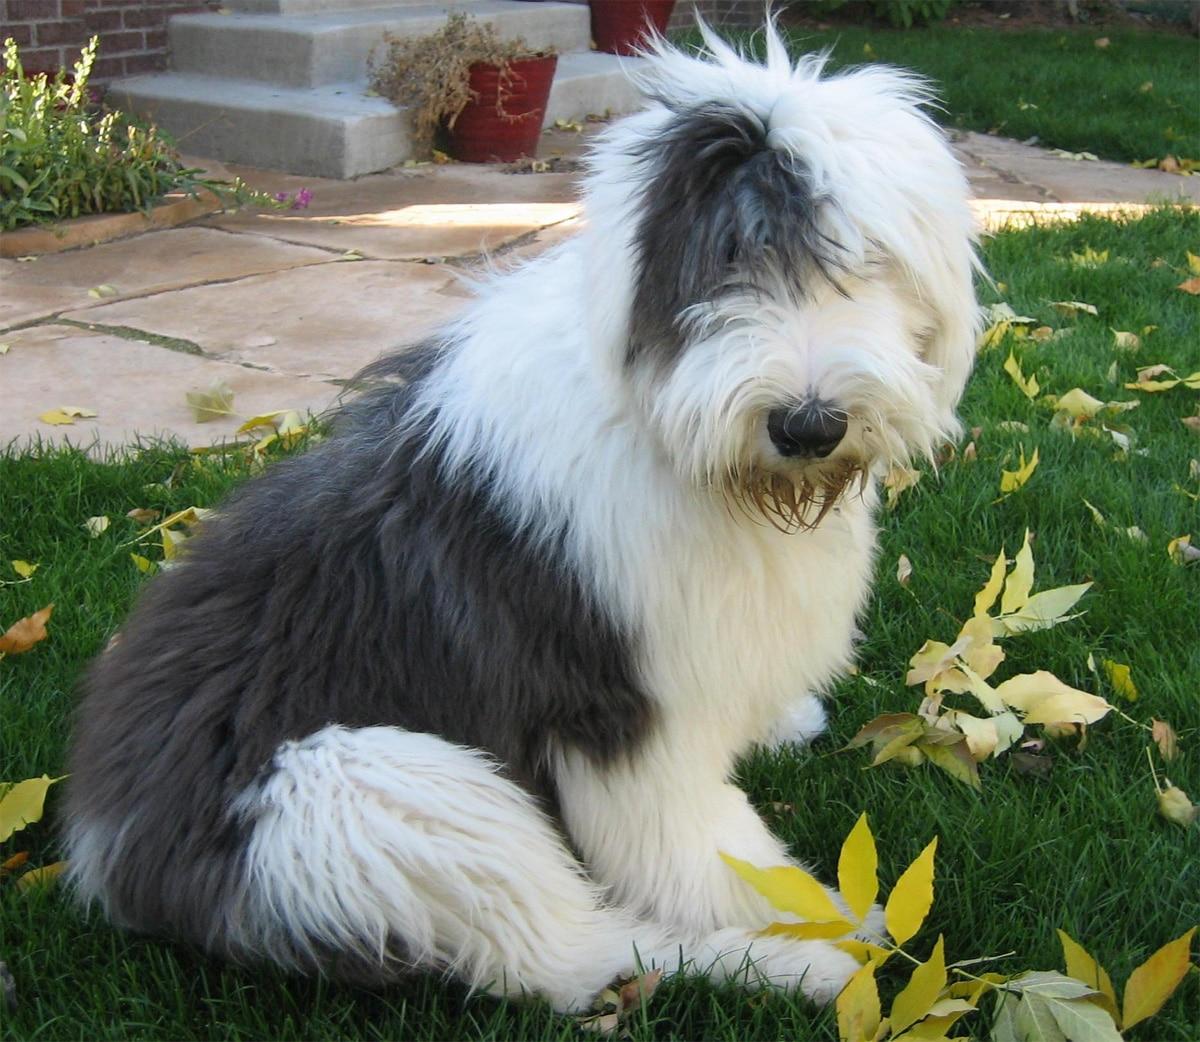 Old English Sheepdog - Dogs breeds